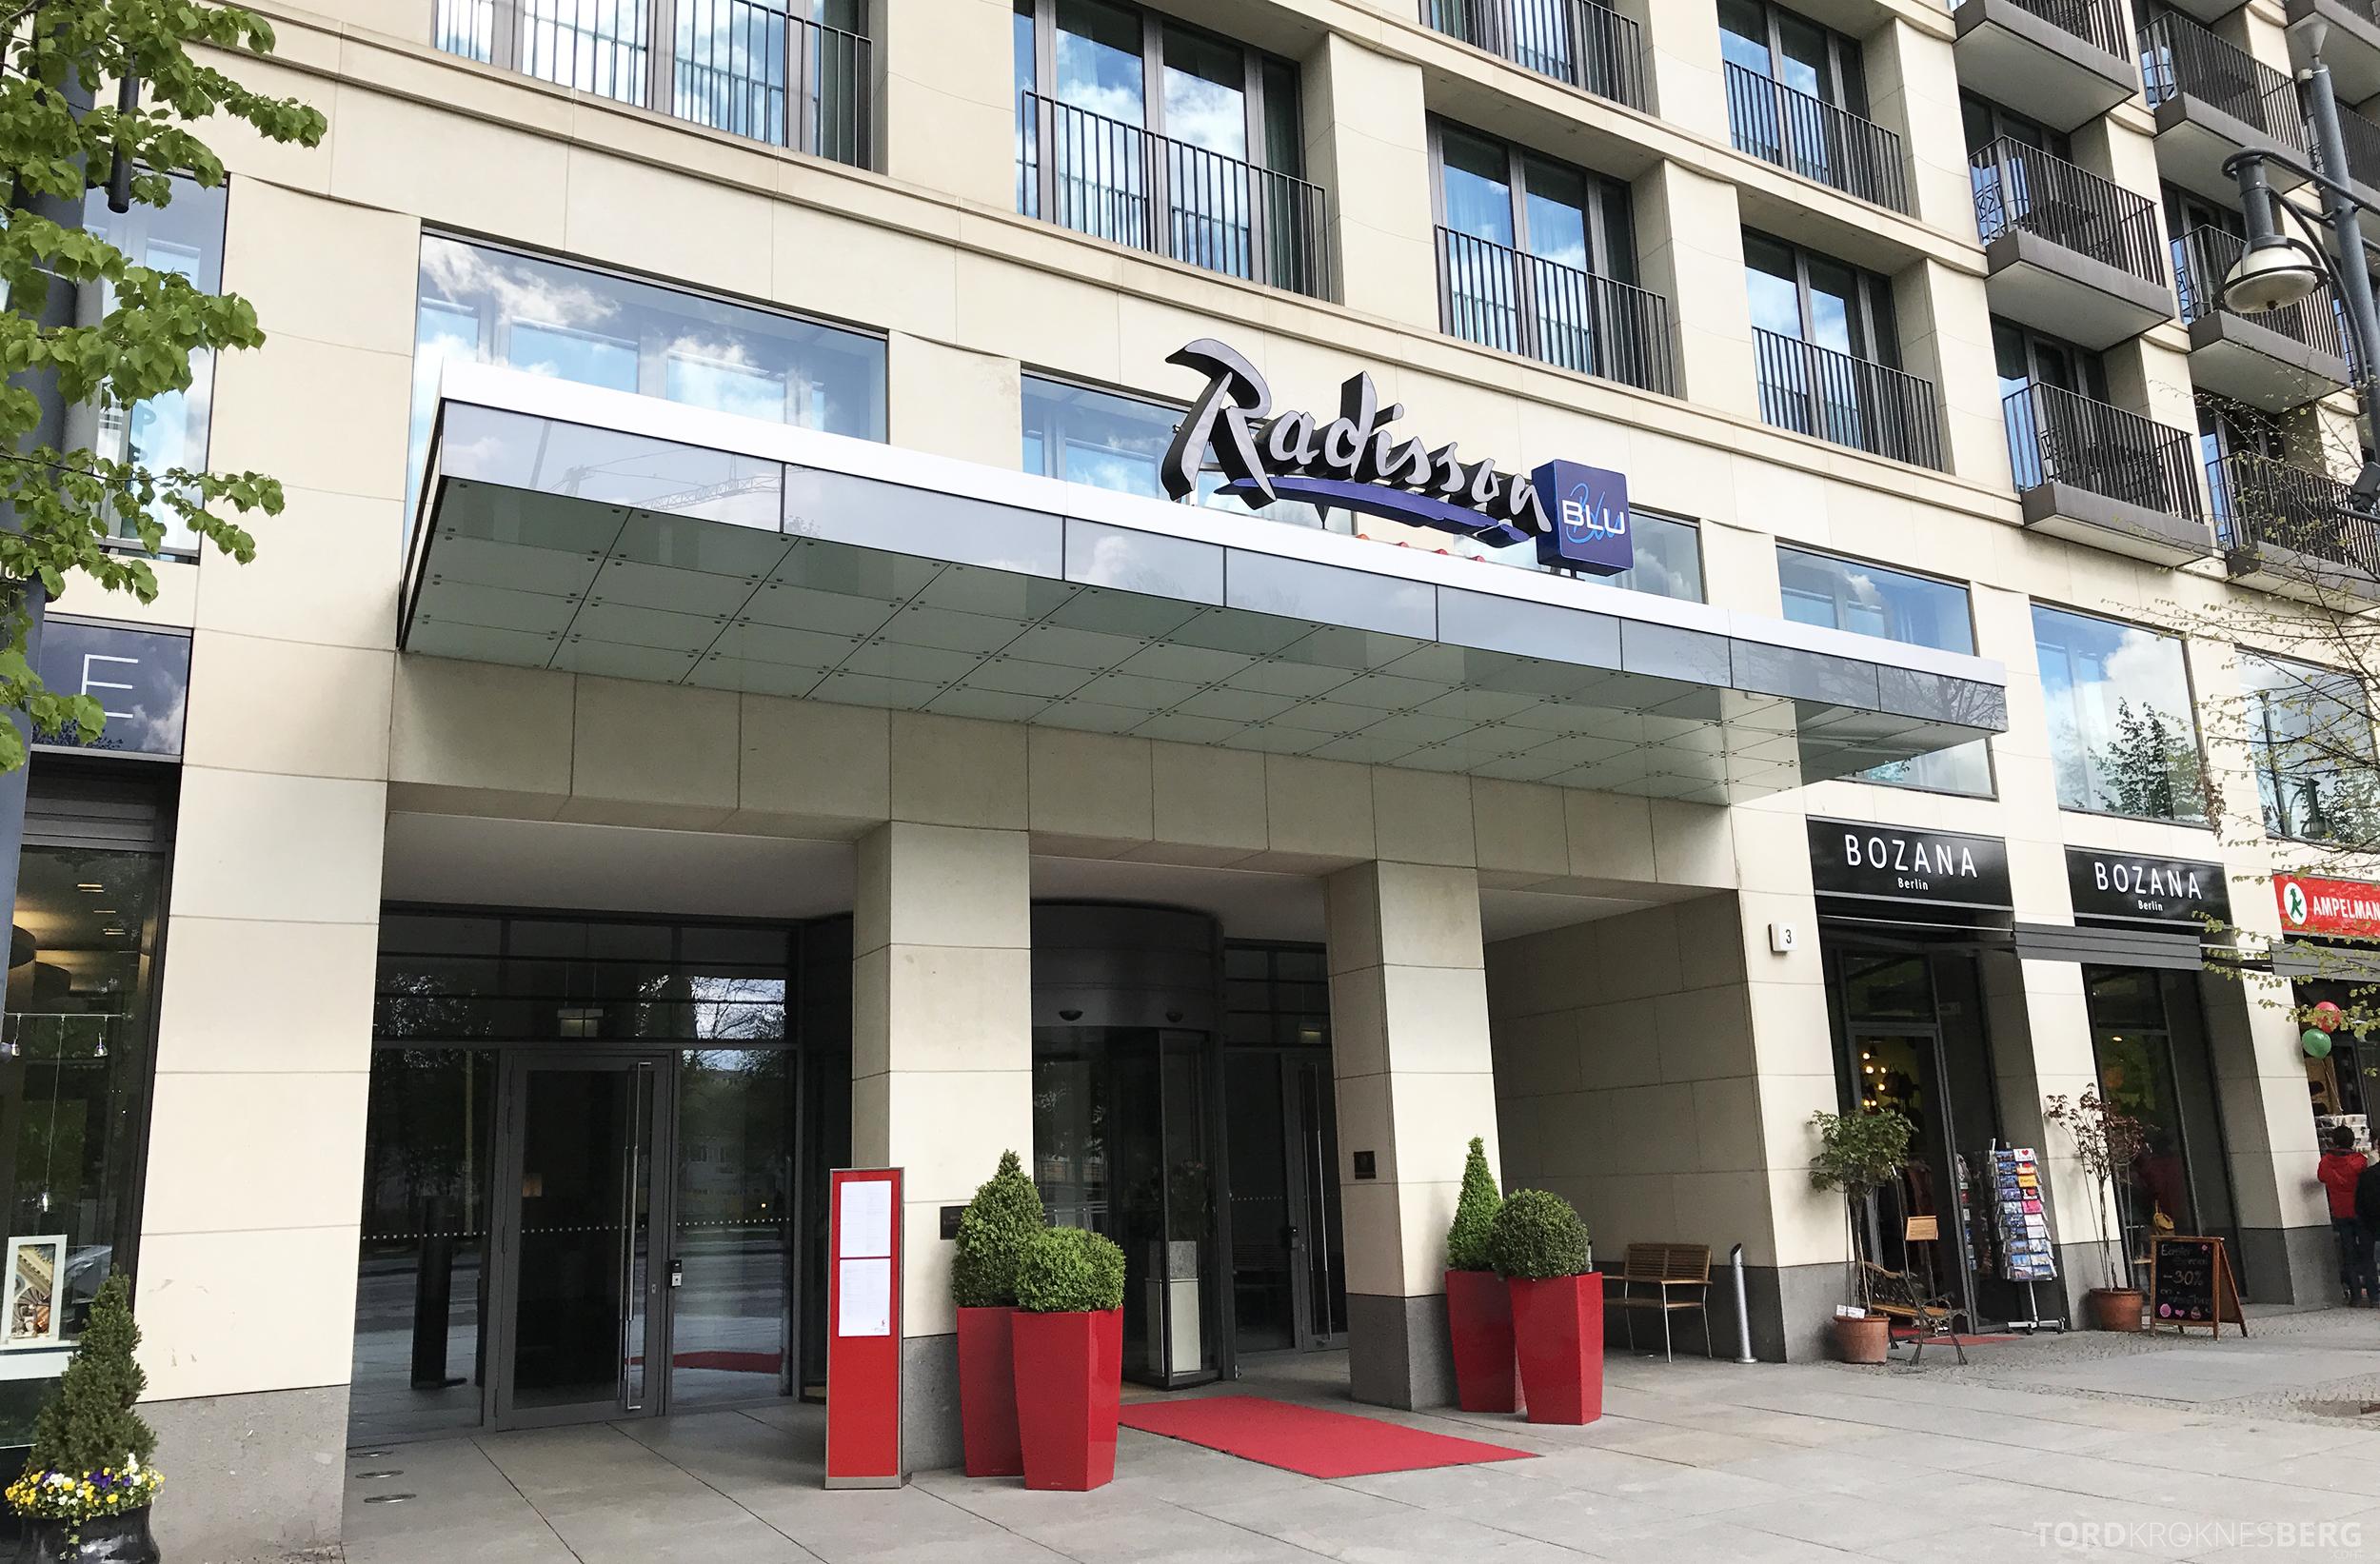 Radisson Blu Berlin inngang